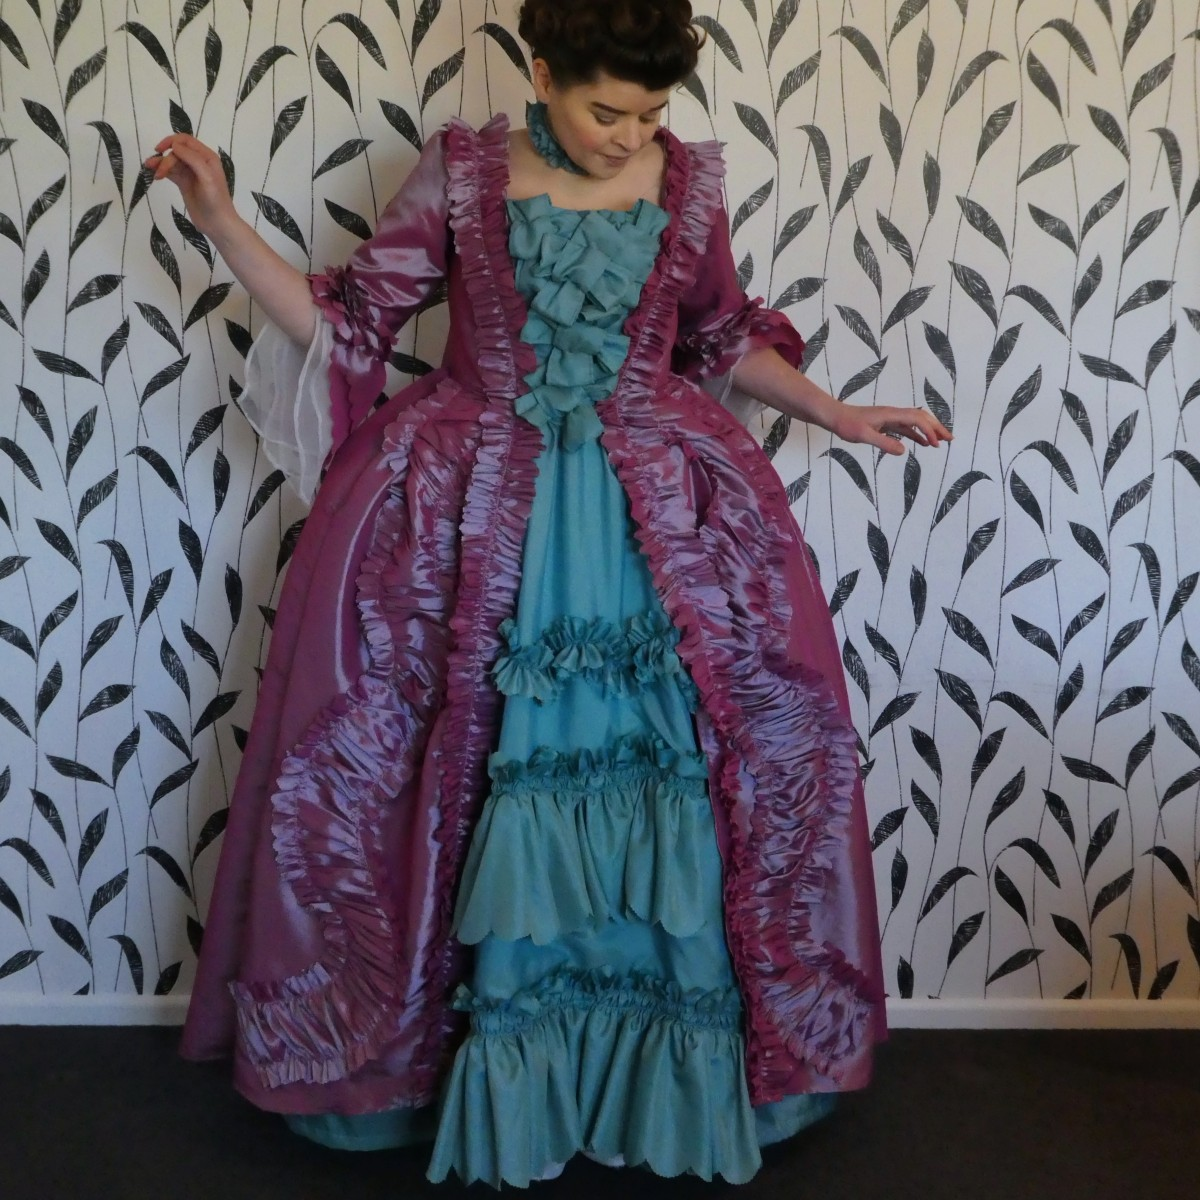 43 Stunning And Insanely Affordable Wedding Dresses Under ...  |Bastille Dress